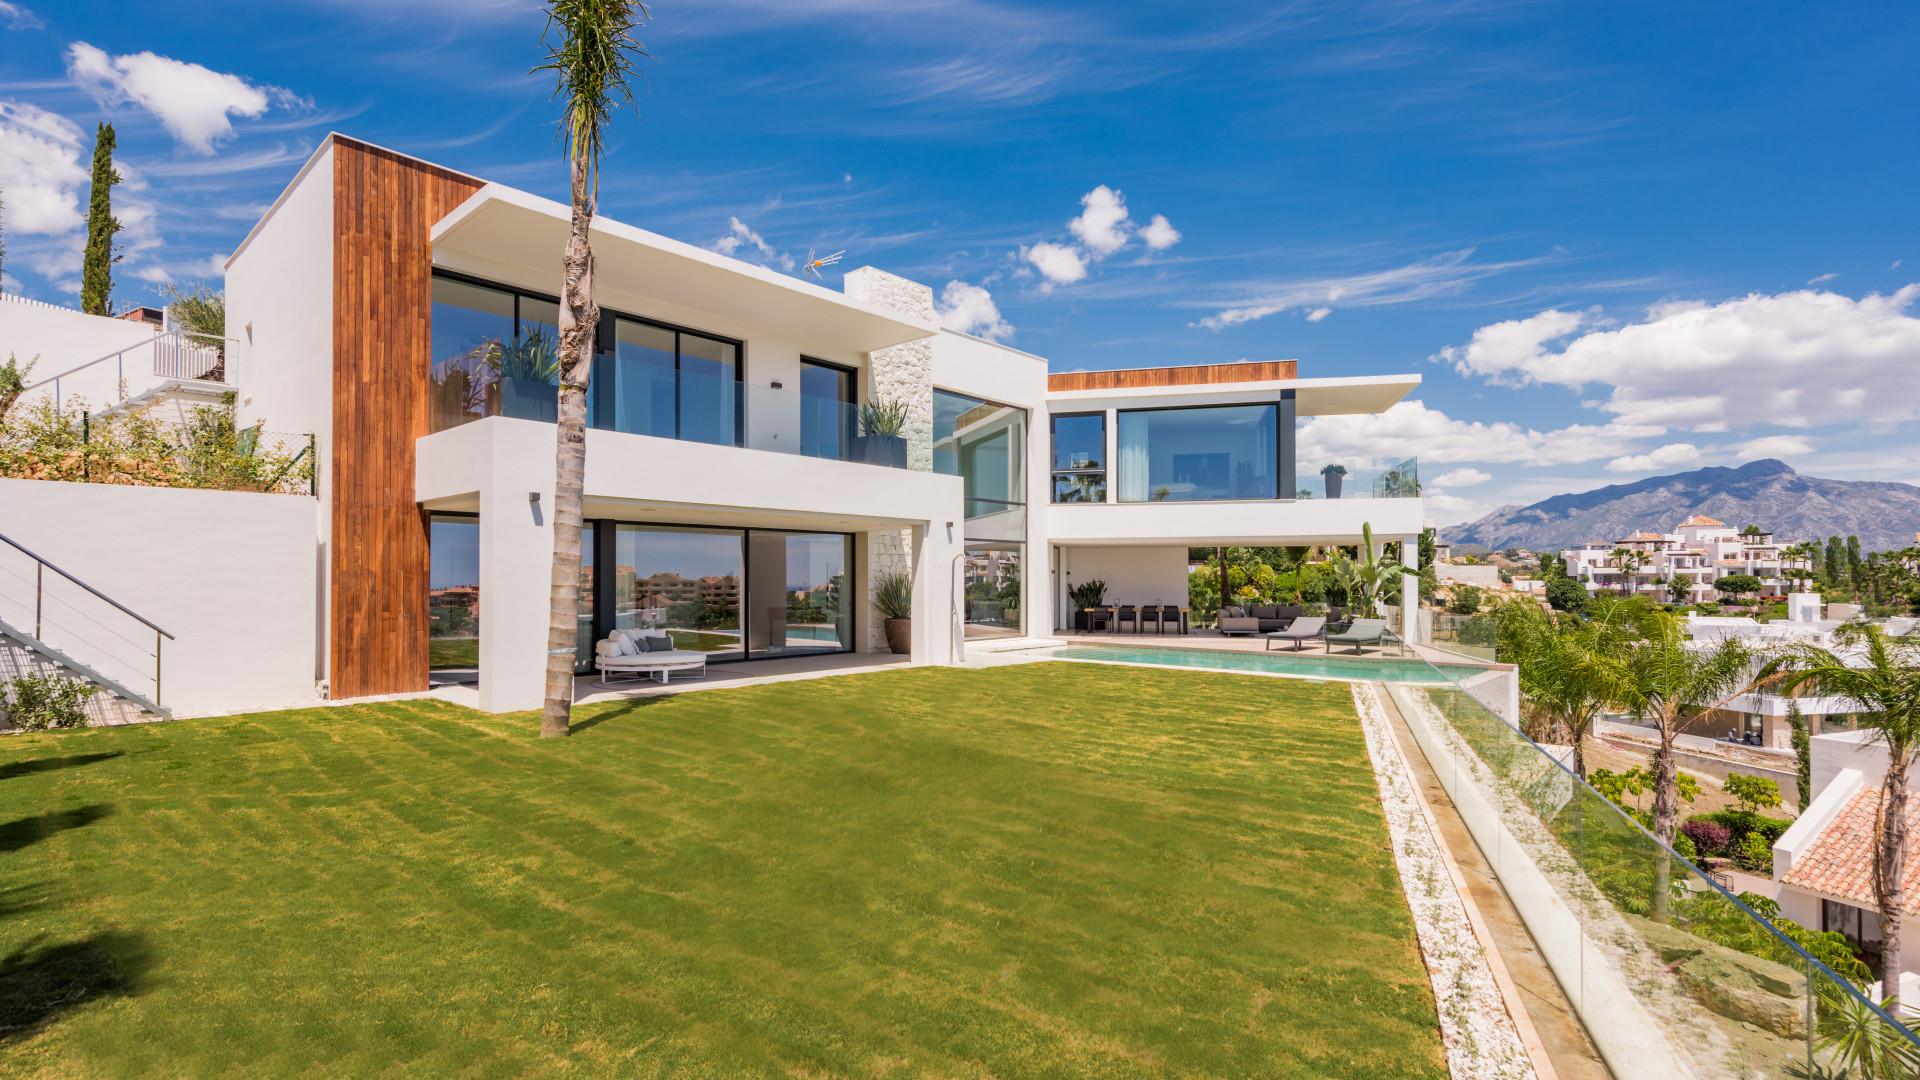 ARFV1983 - Moderne Luxus Villa zum Verkauf in La Alqueria in Benahavis